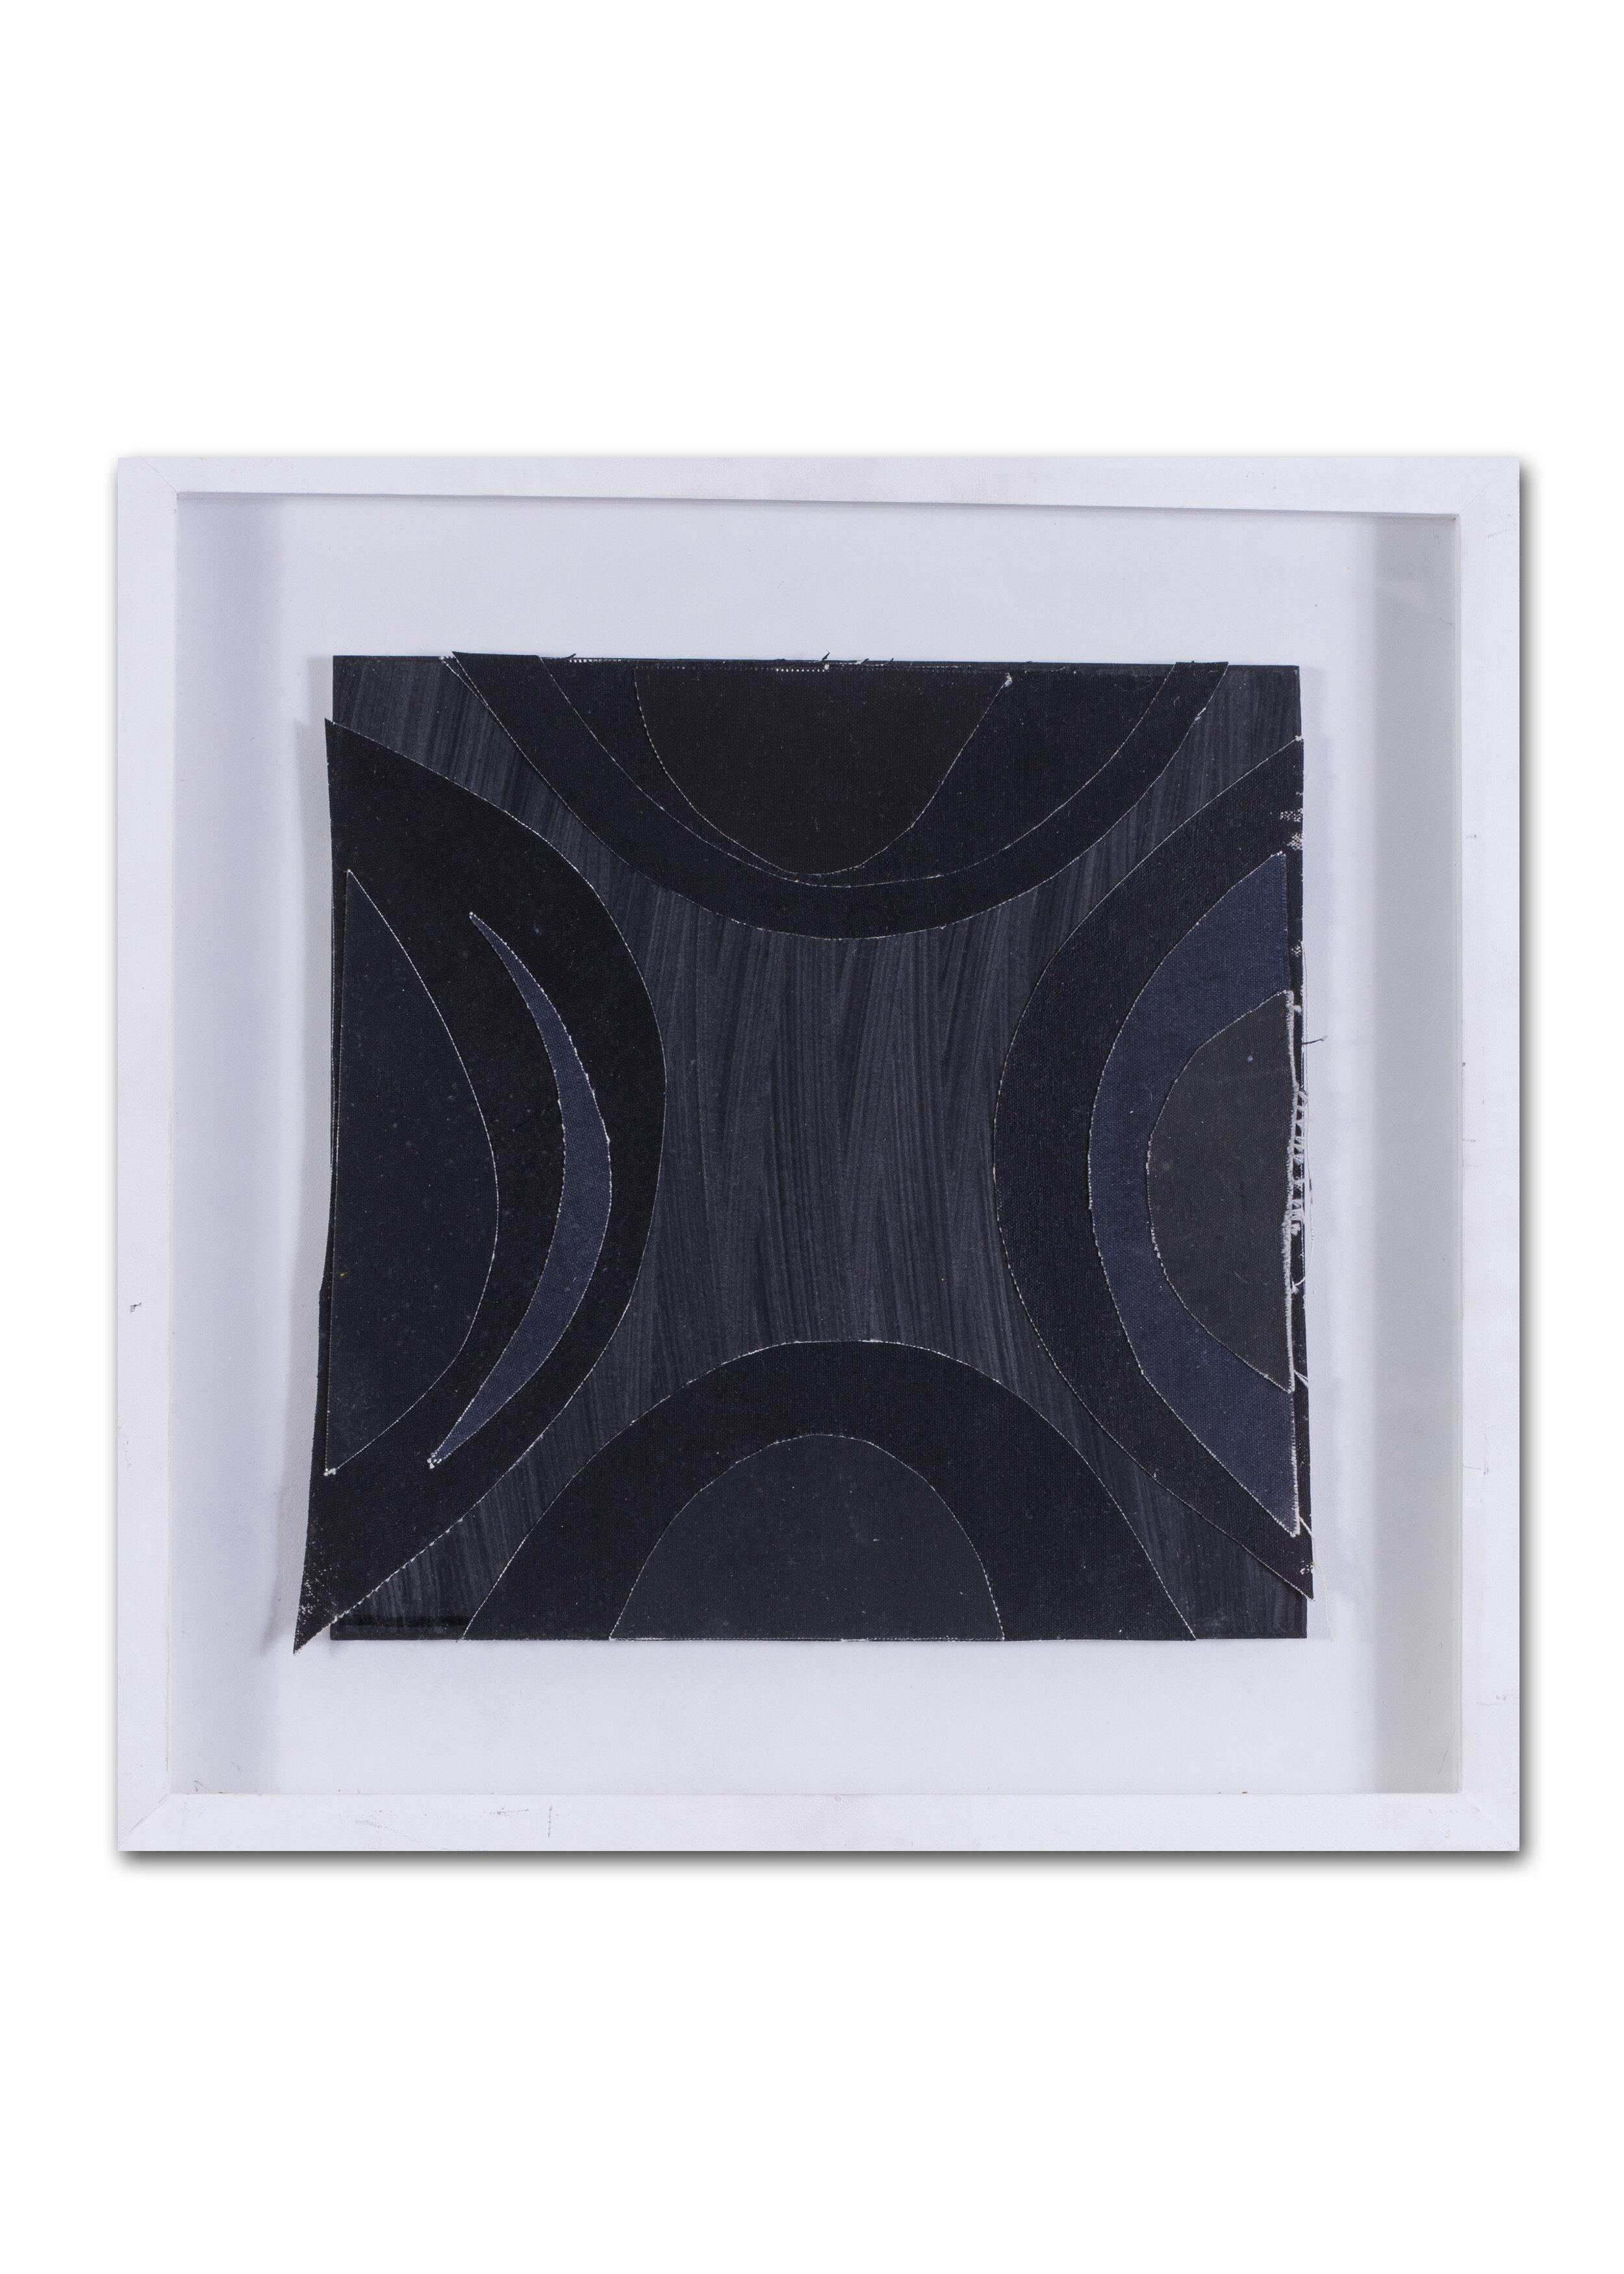 Sir Terry Frost RA    Blacks    Price: £4,200